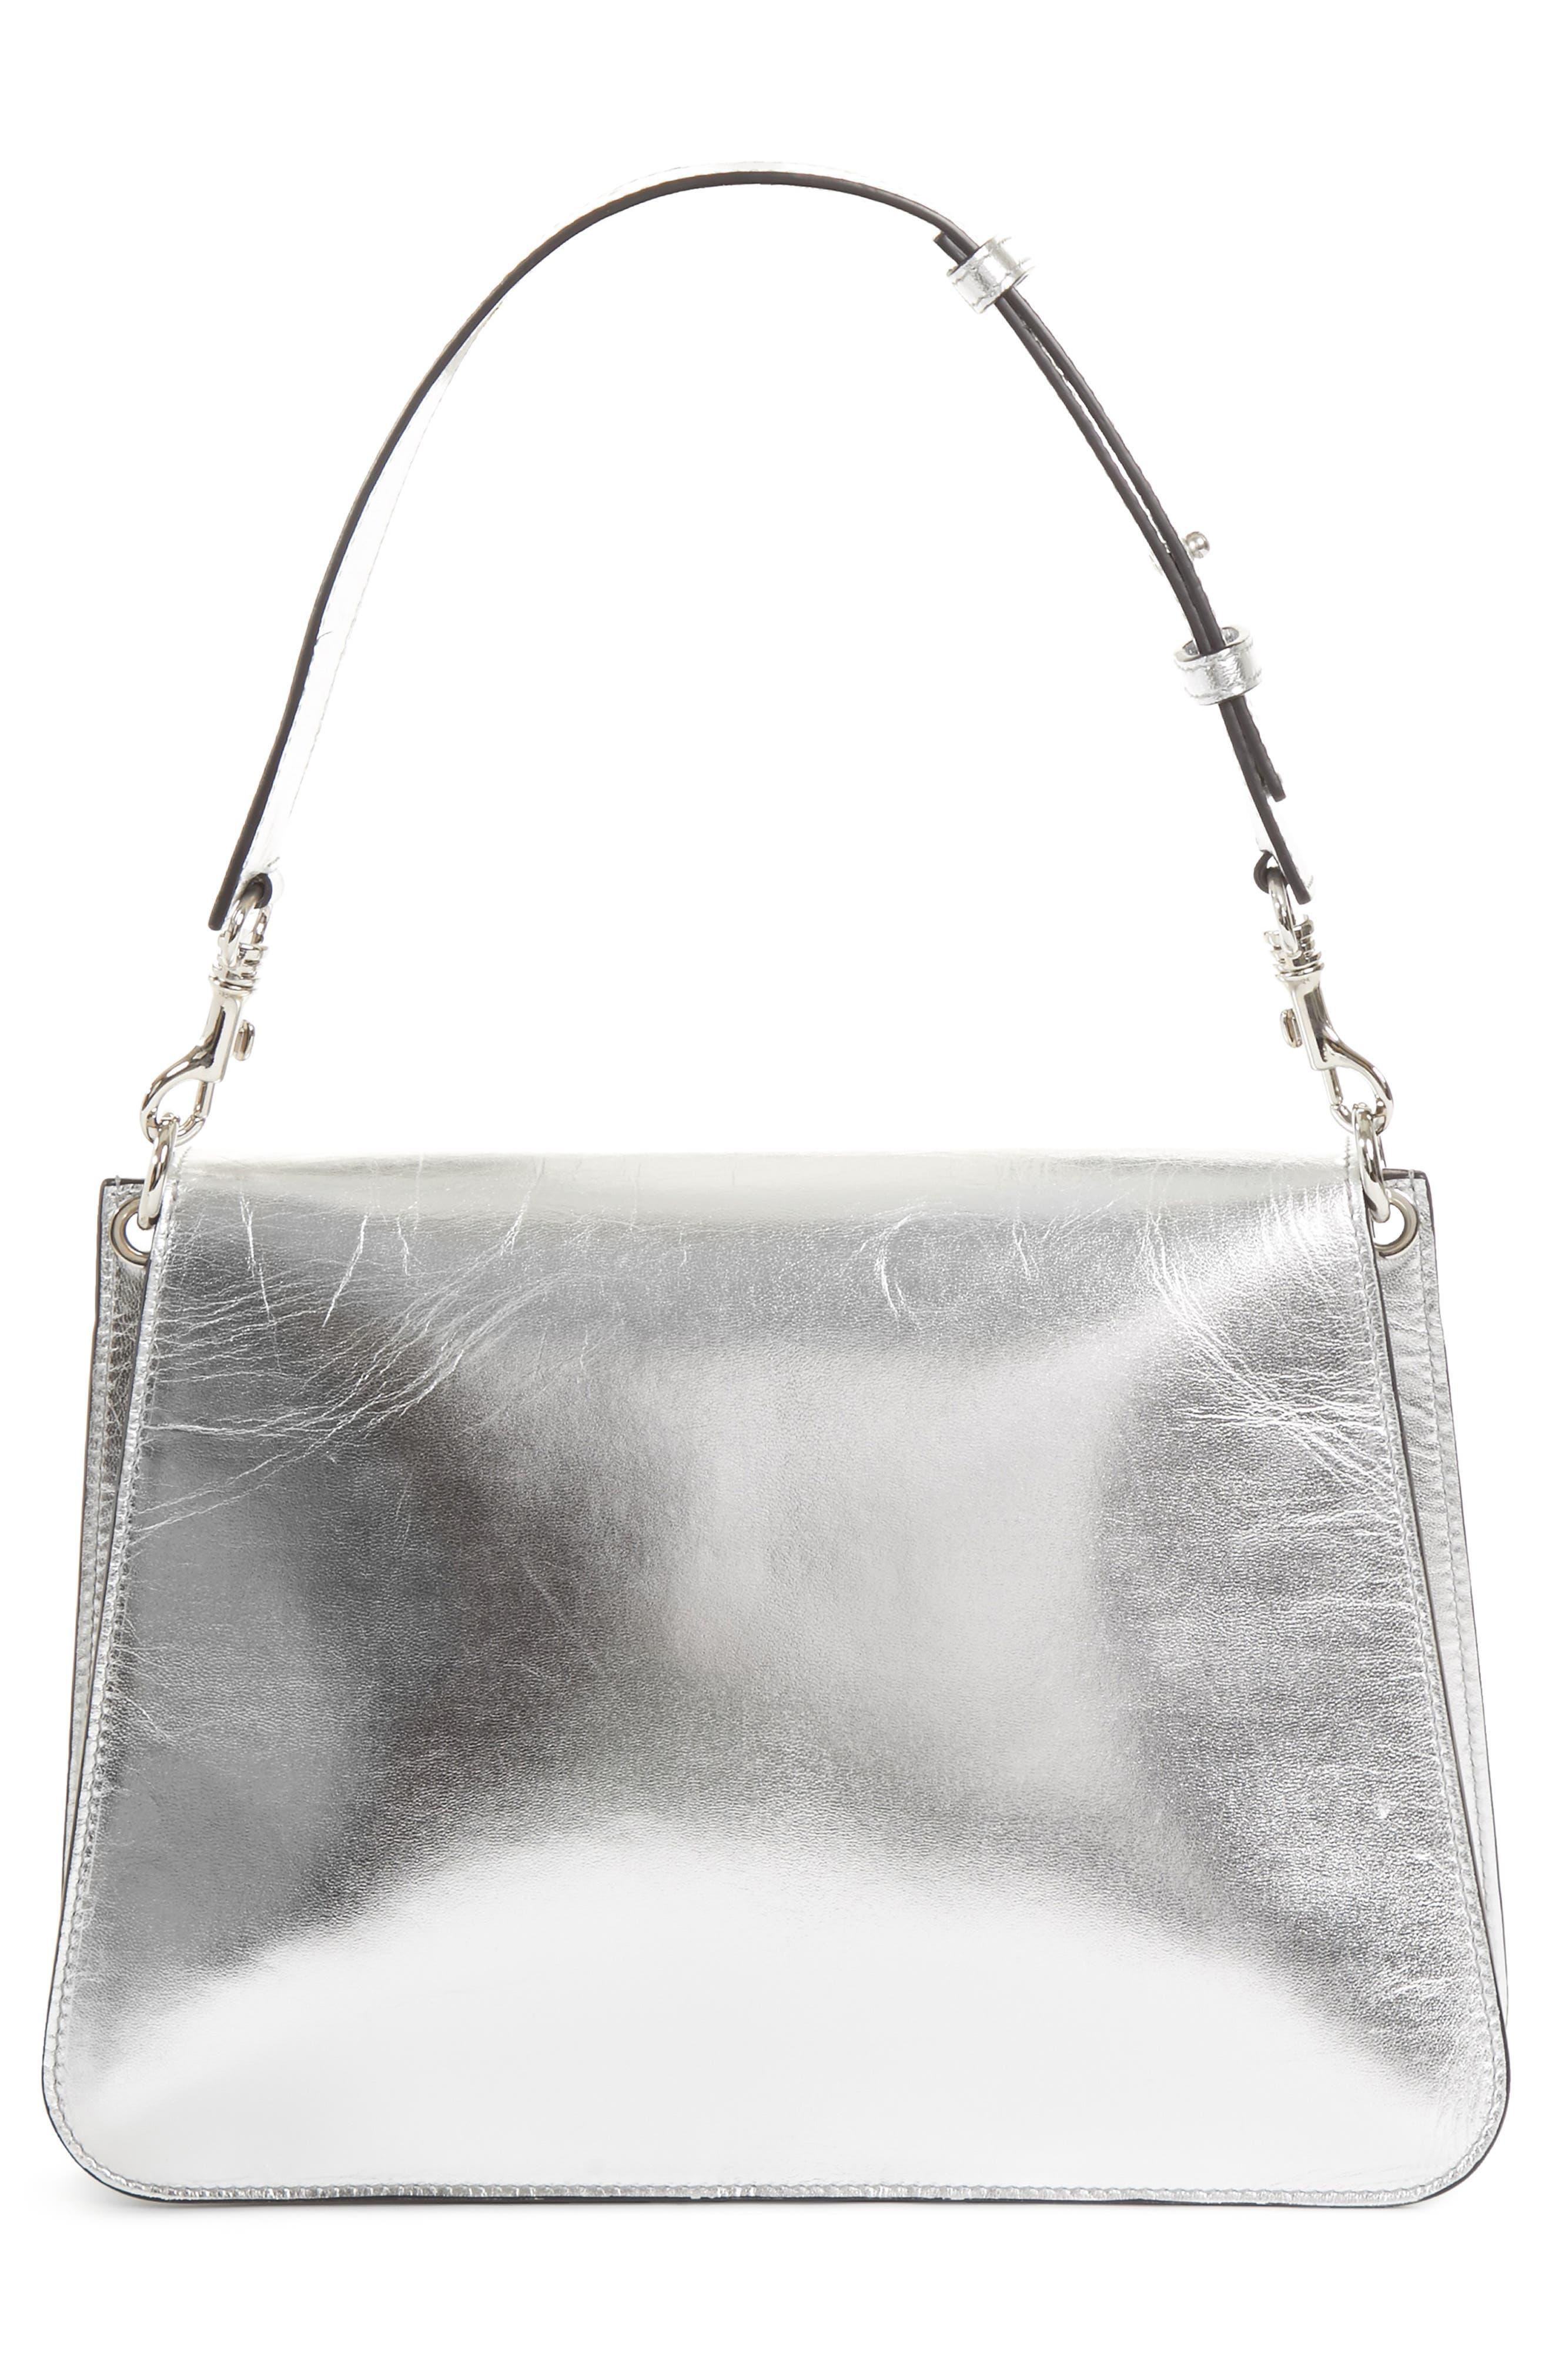 J.W.ANDERSON Medium Pierce Metallic Shoulder Bag,                             Alternate thumbnail 3, color,                             040